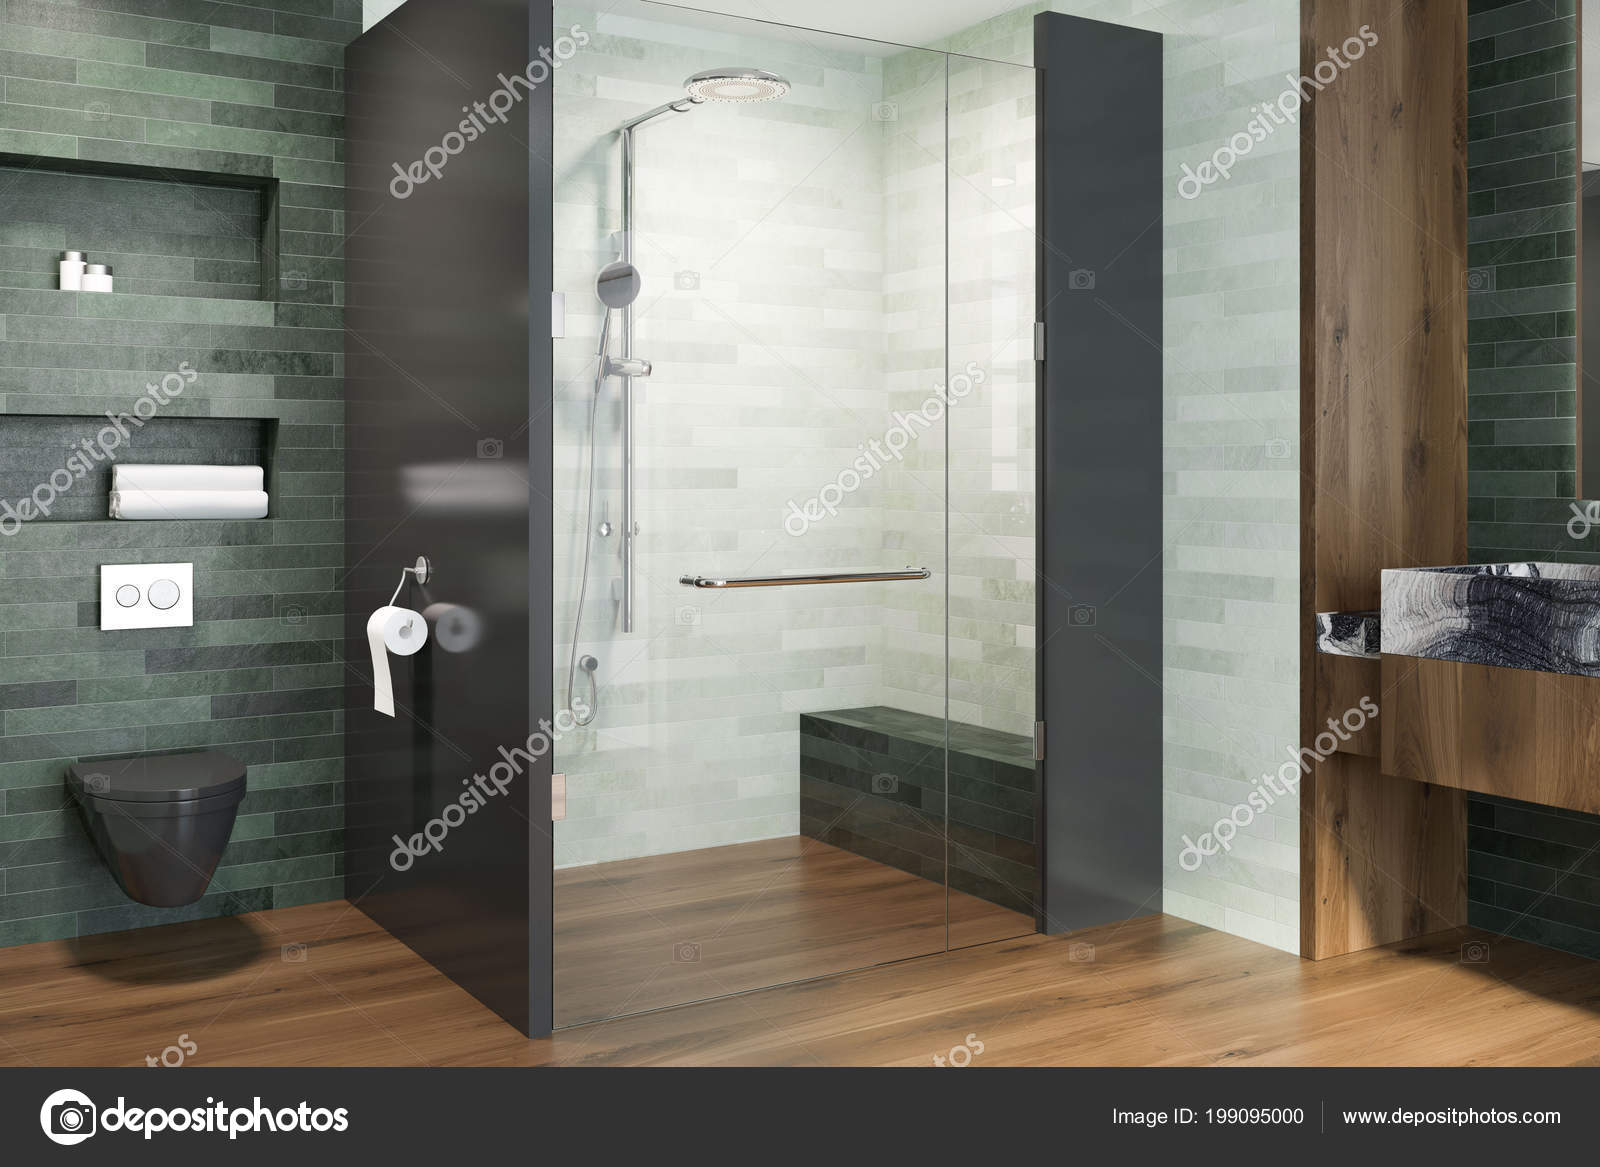 Luxury Bathroom Interior Emerald White Walls Wooden Floor Black Toilet — Stock Photo